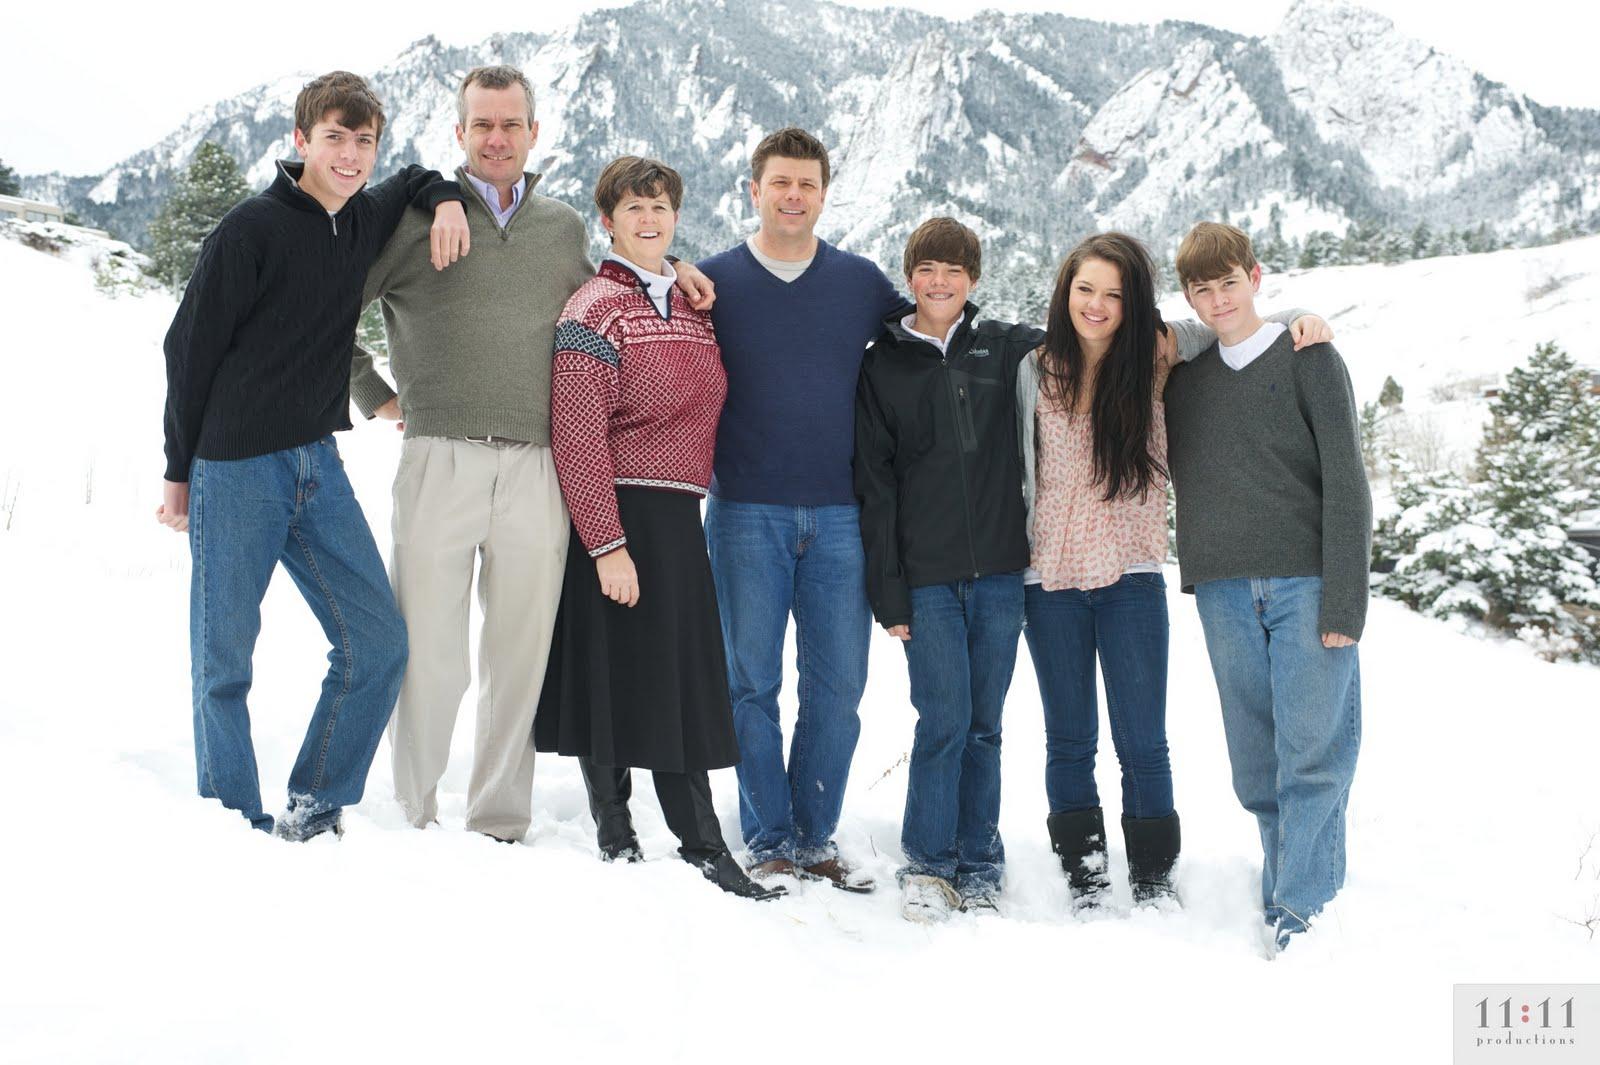 winter family portrait boulder co 11 11 productions photography